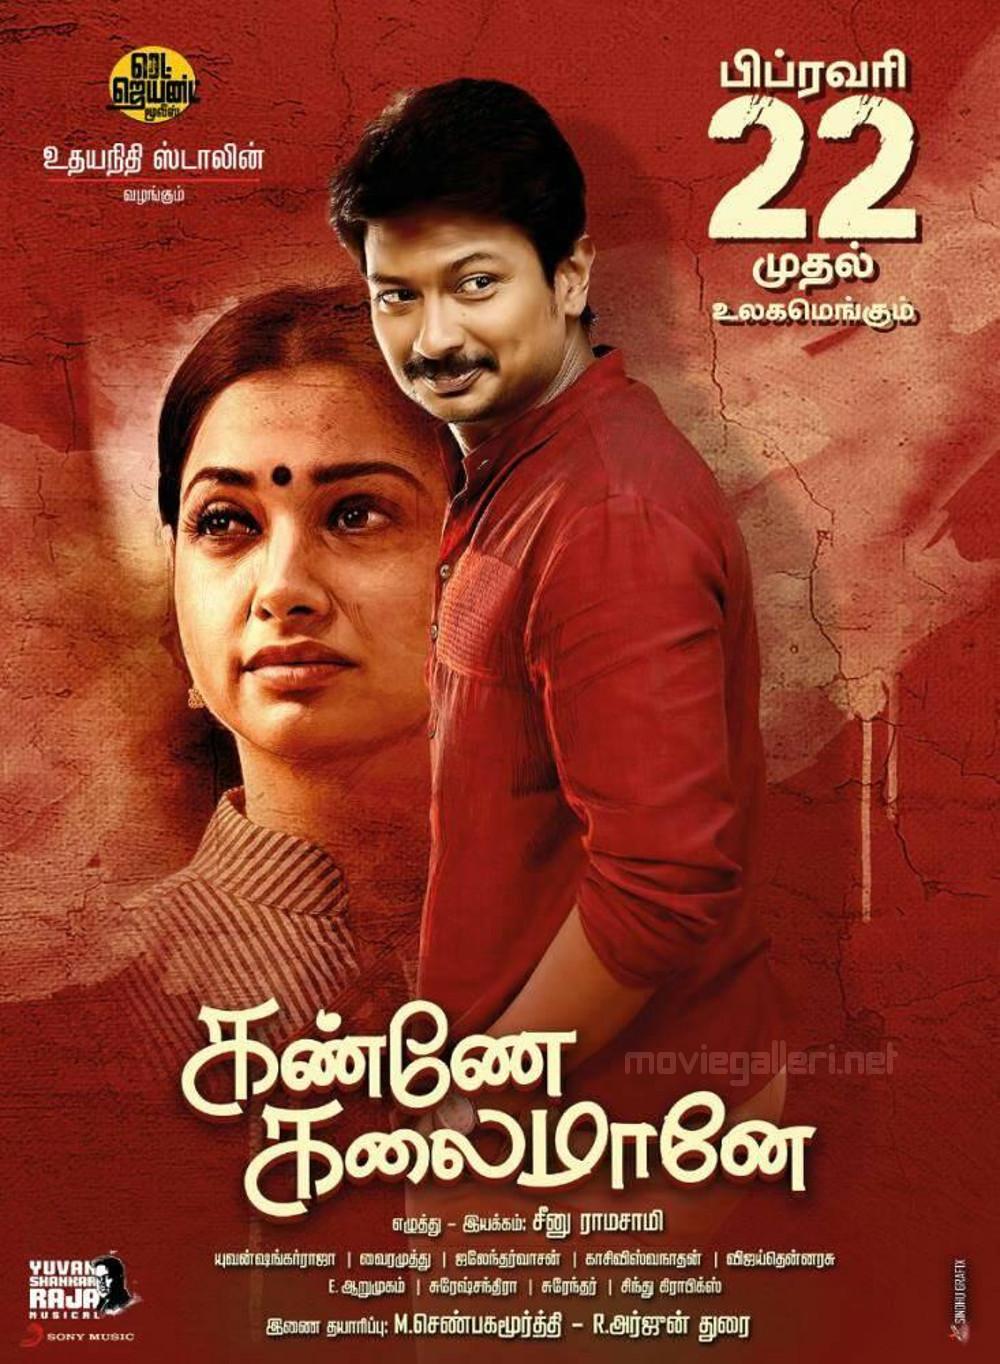 Tamanna Udhayanidhi Stalin Kanne Kalaimane Release Date on February 22 Poster